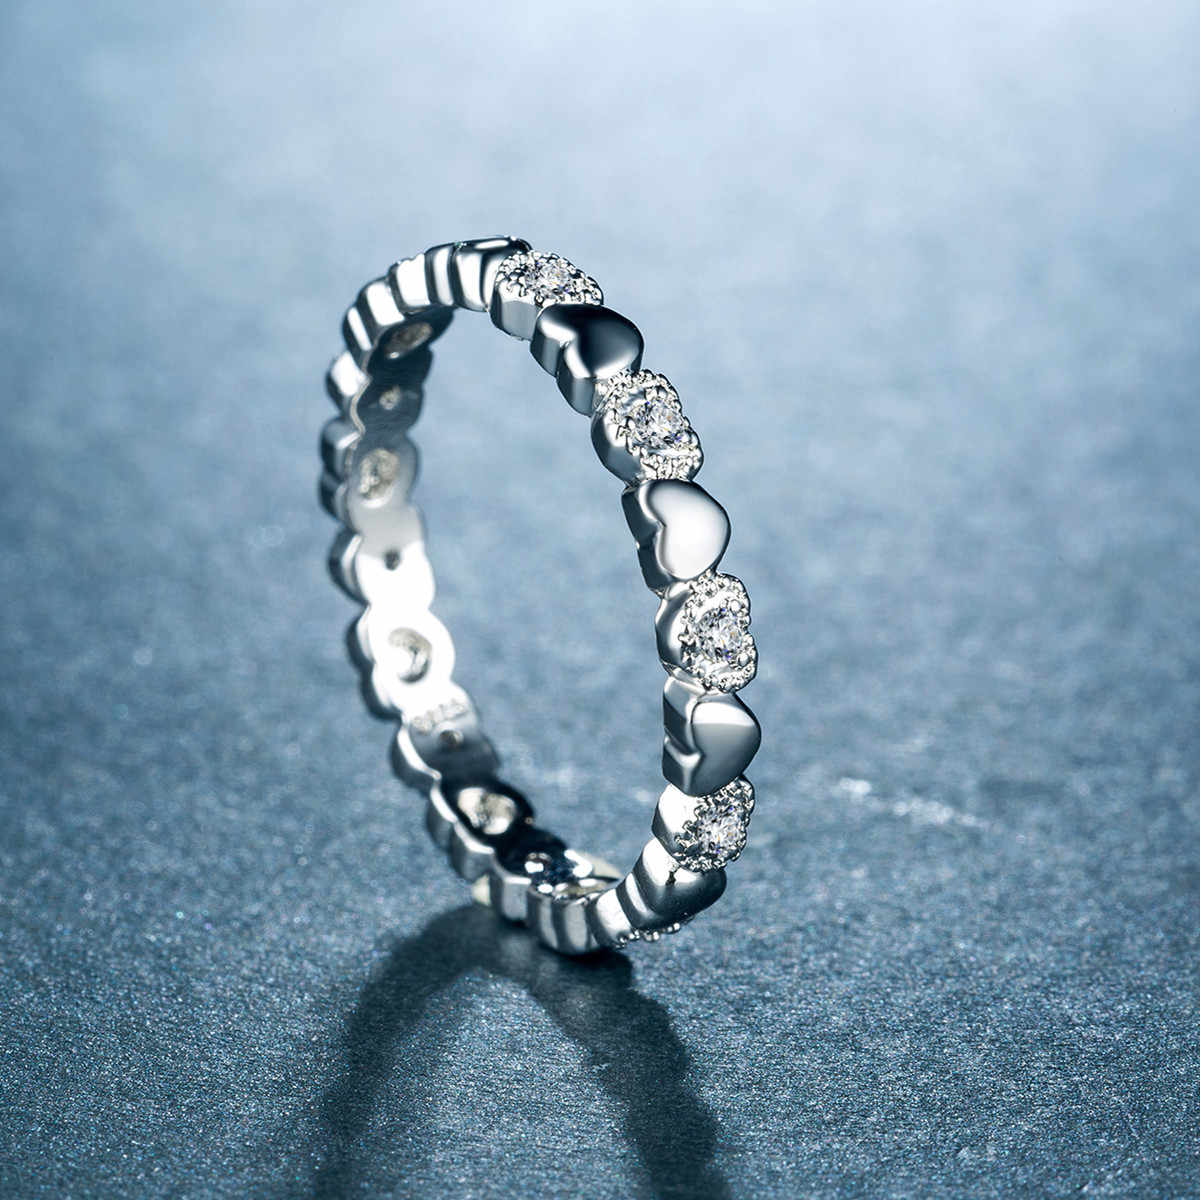 Nuevo diseño creativo de moda corazones Micro circón señora anillos exquisitos cobre plateado joyería anillos de compromiso